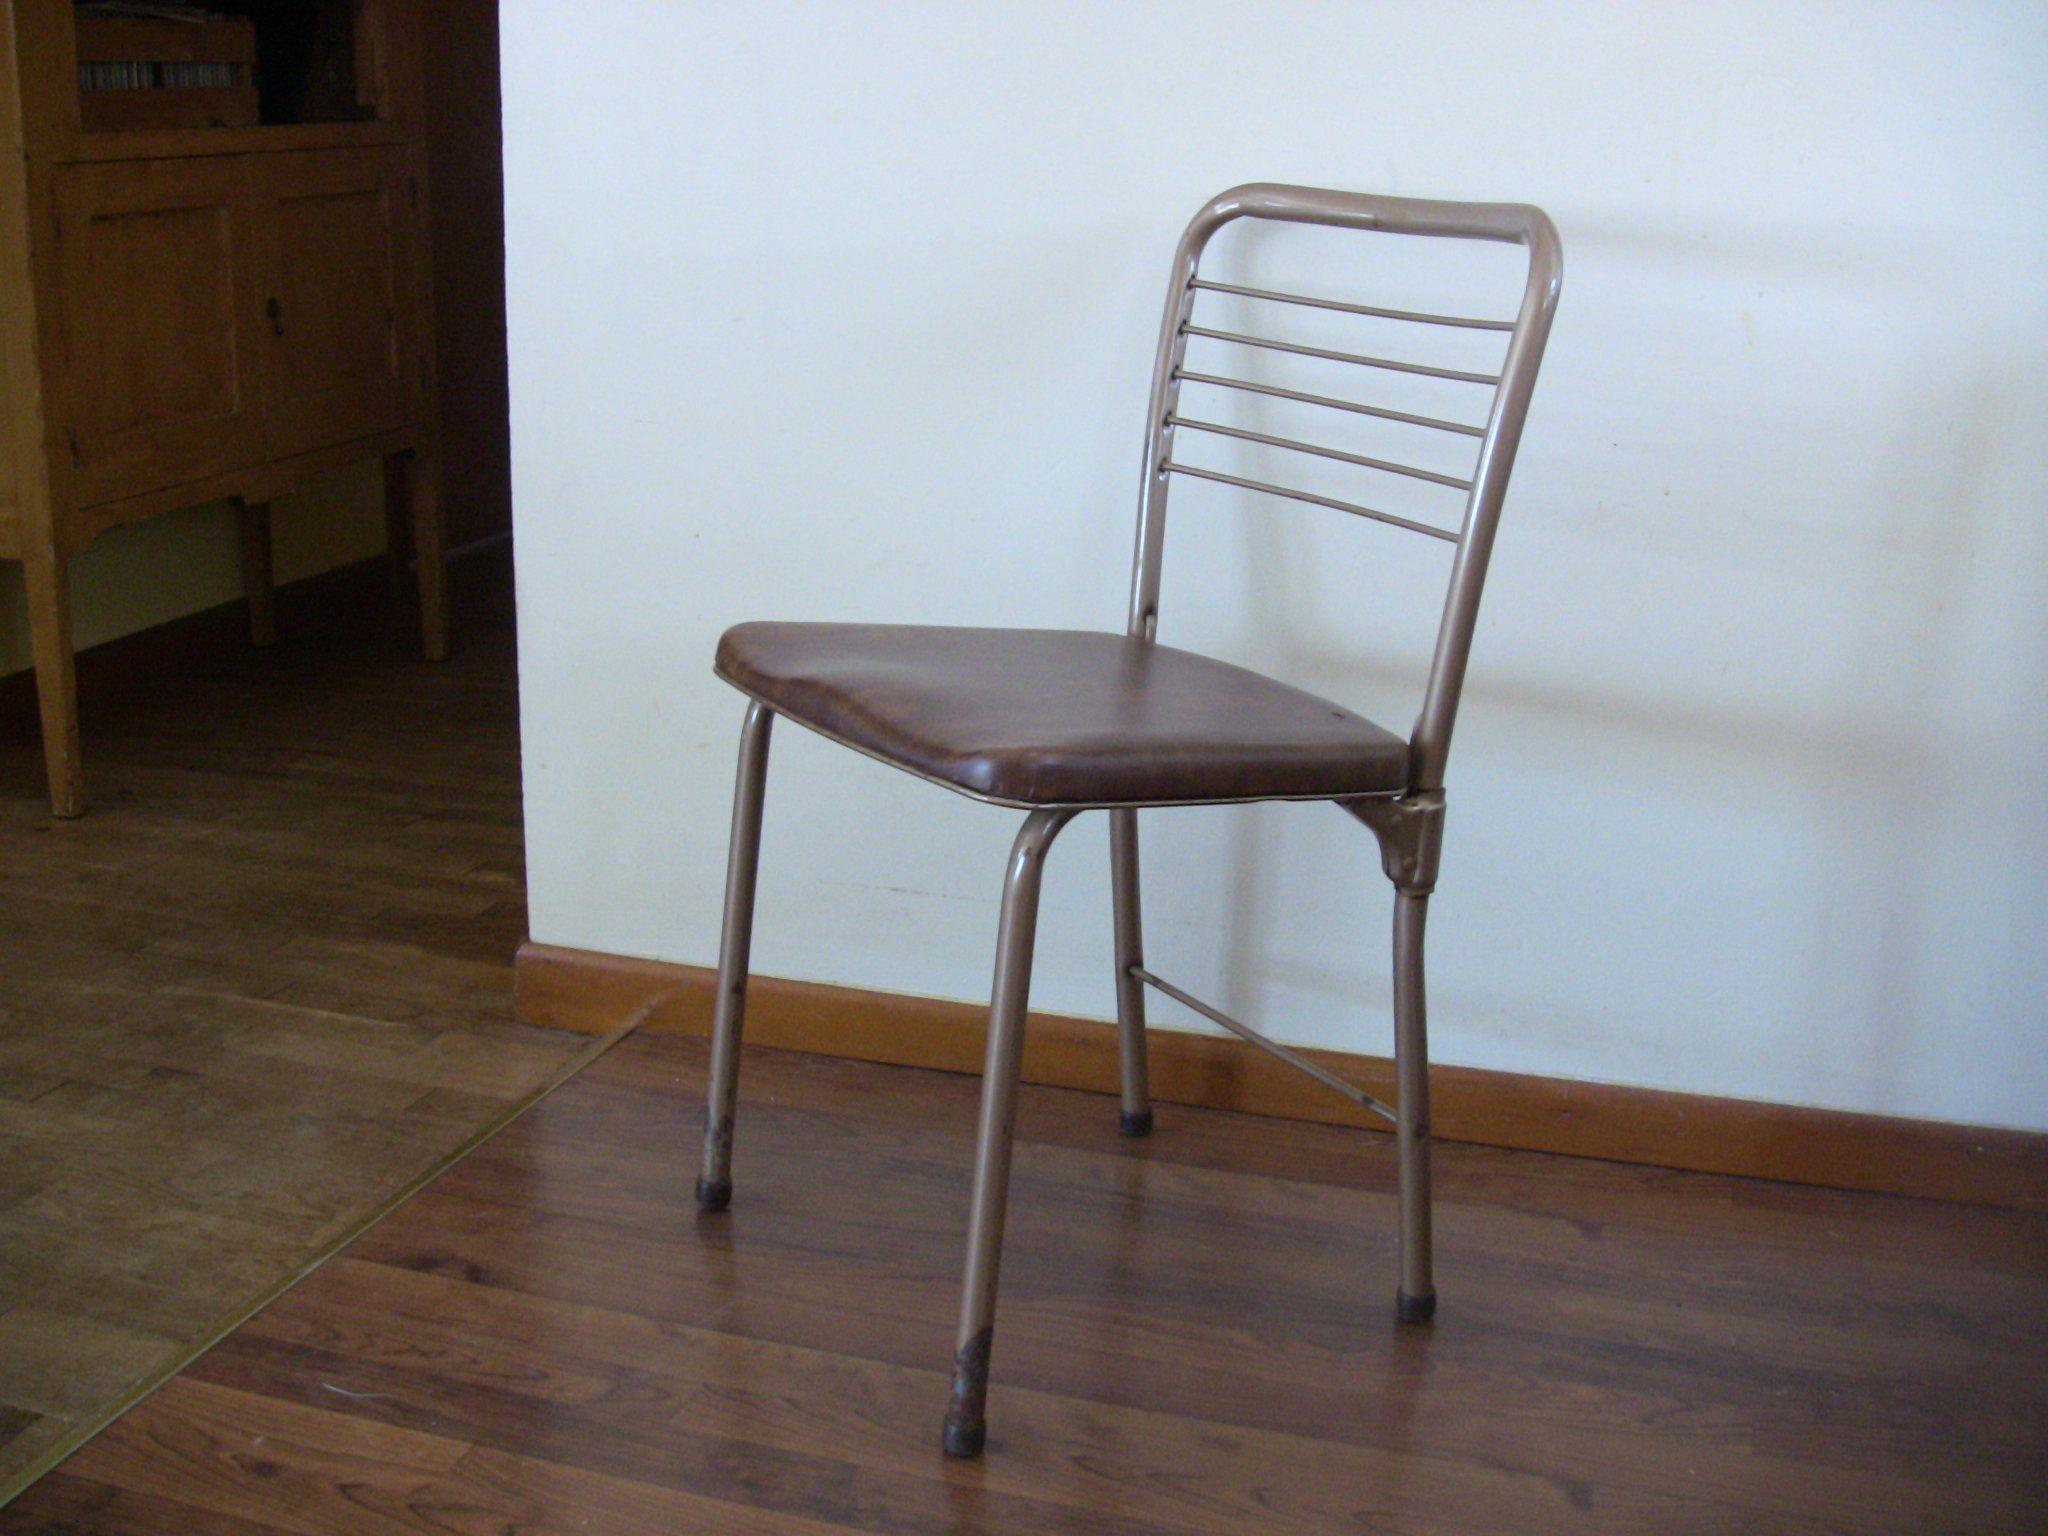 Vintage Mid Century Modern Metal Folding Chair Steel Cosco Vinyl